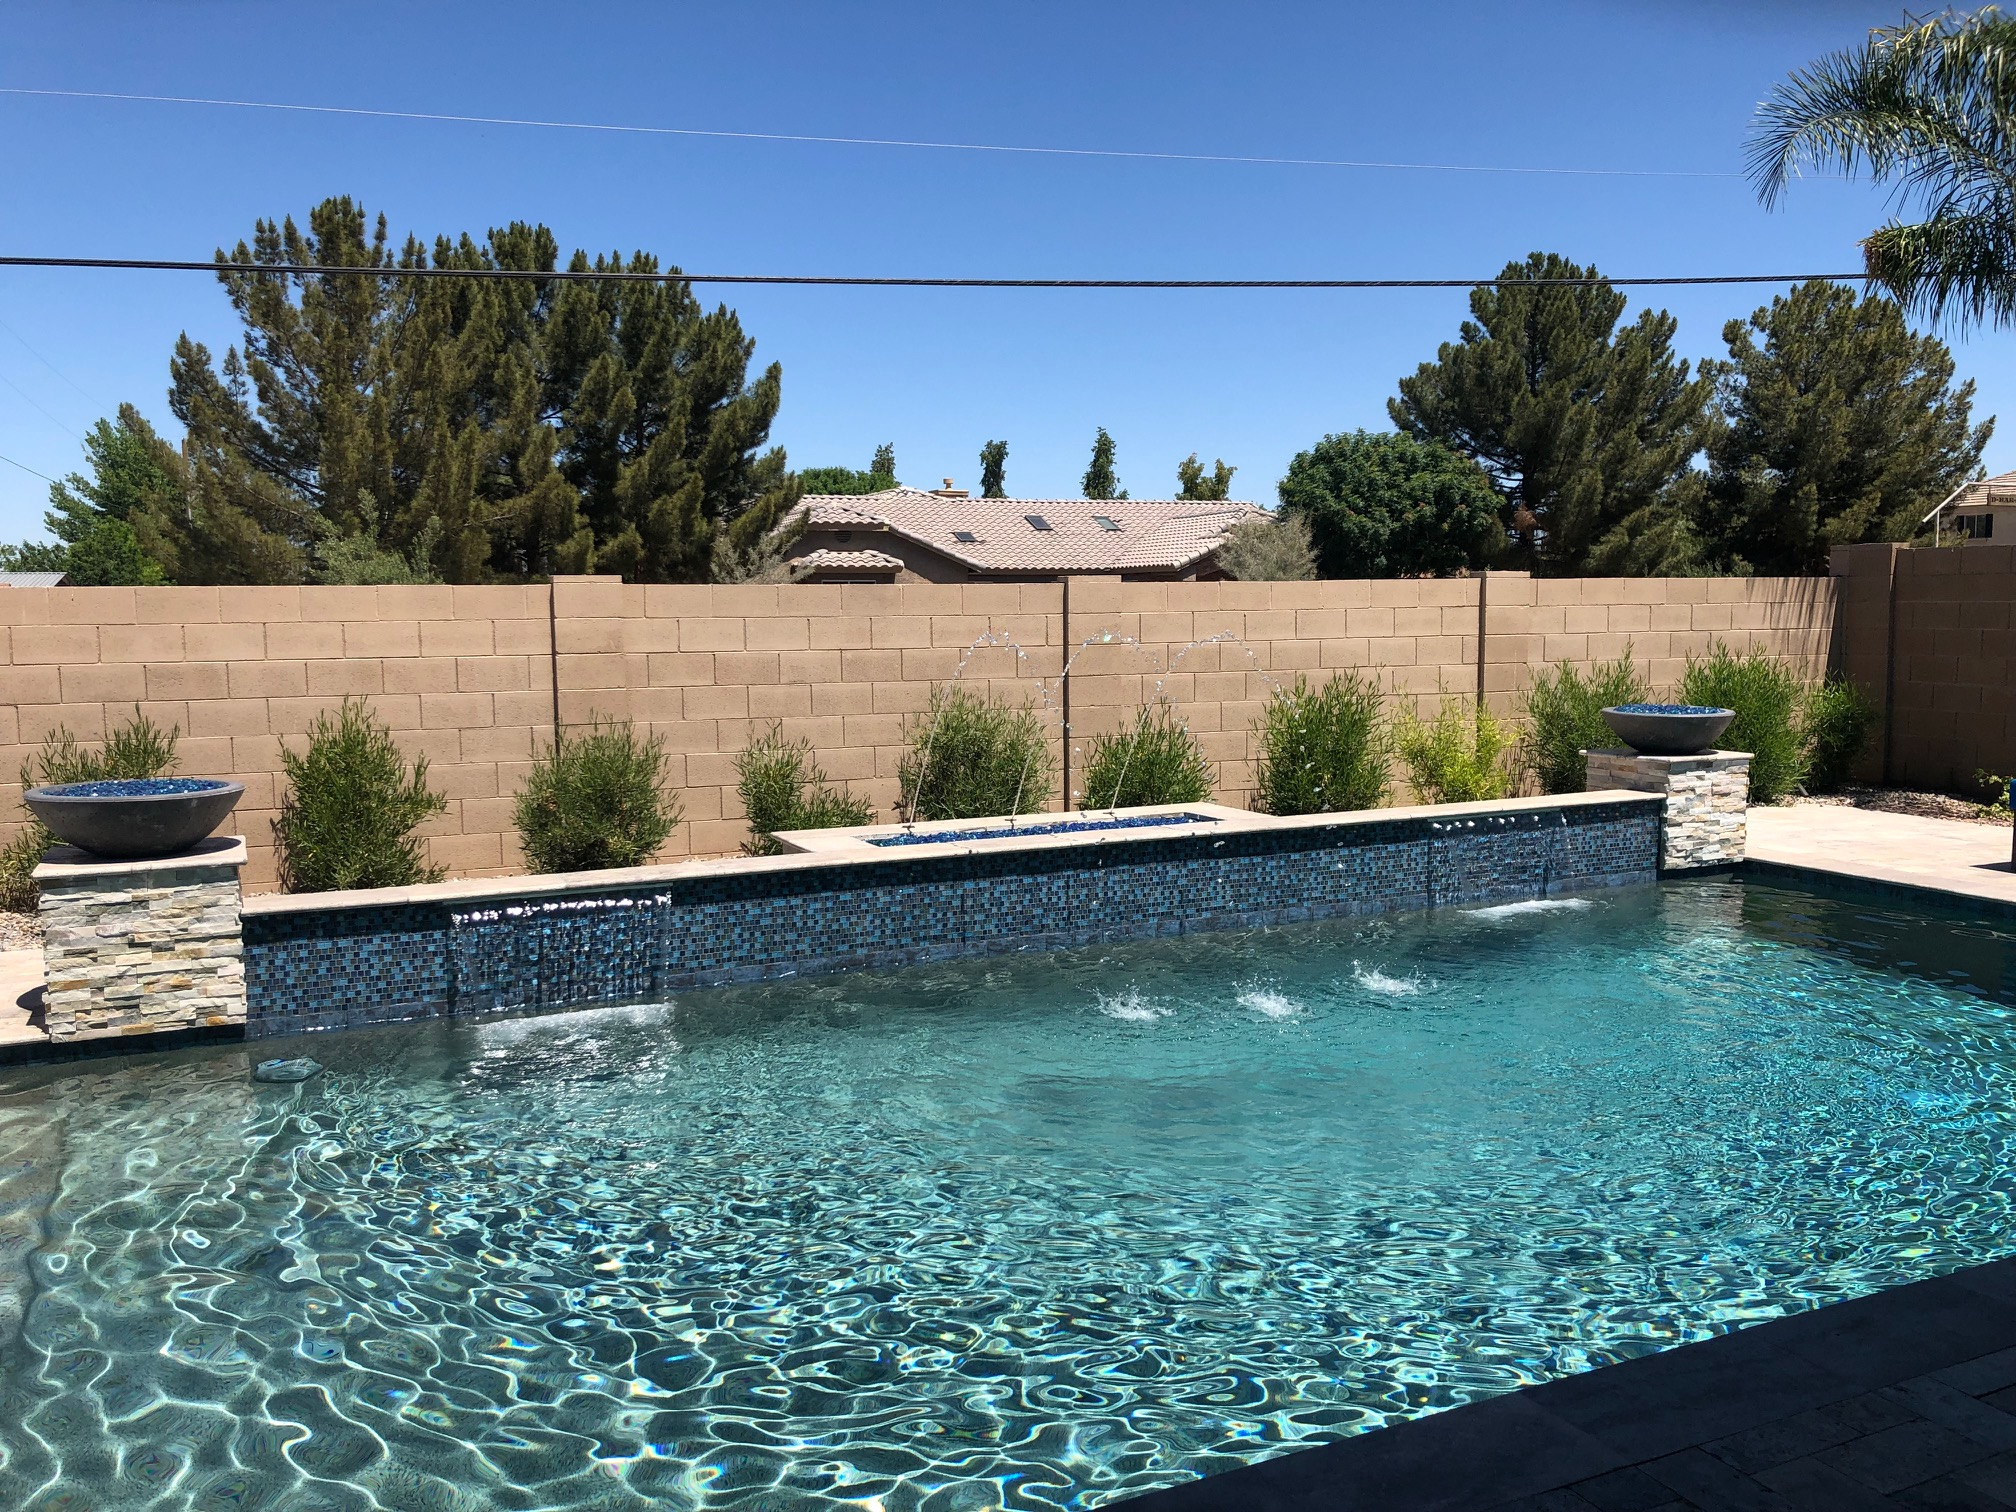 Swimming Pool Builders In Phoenix Az Swimming Pool Contractors In Scottsdale Tempe Phoenix Az